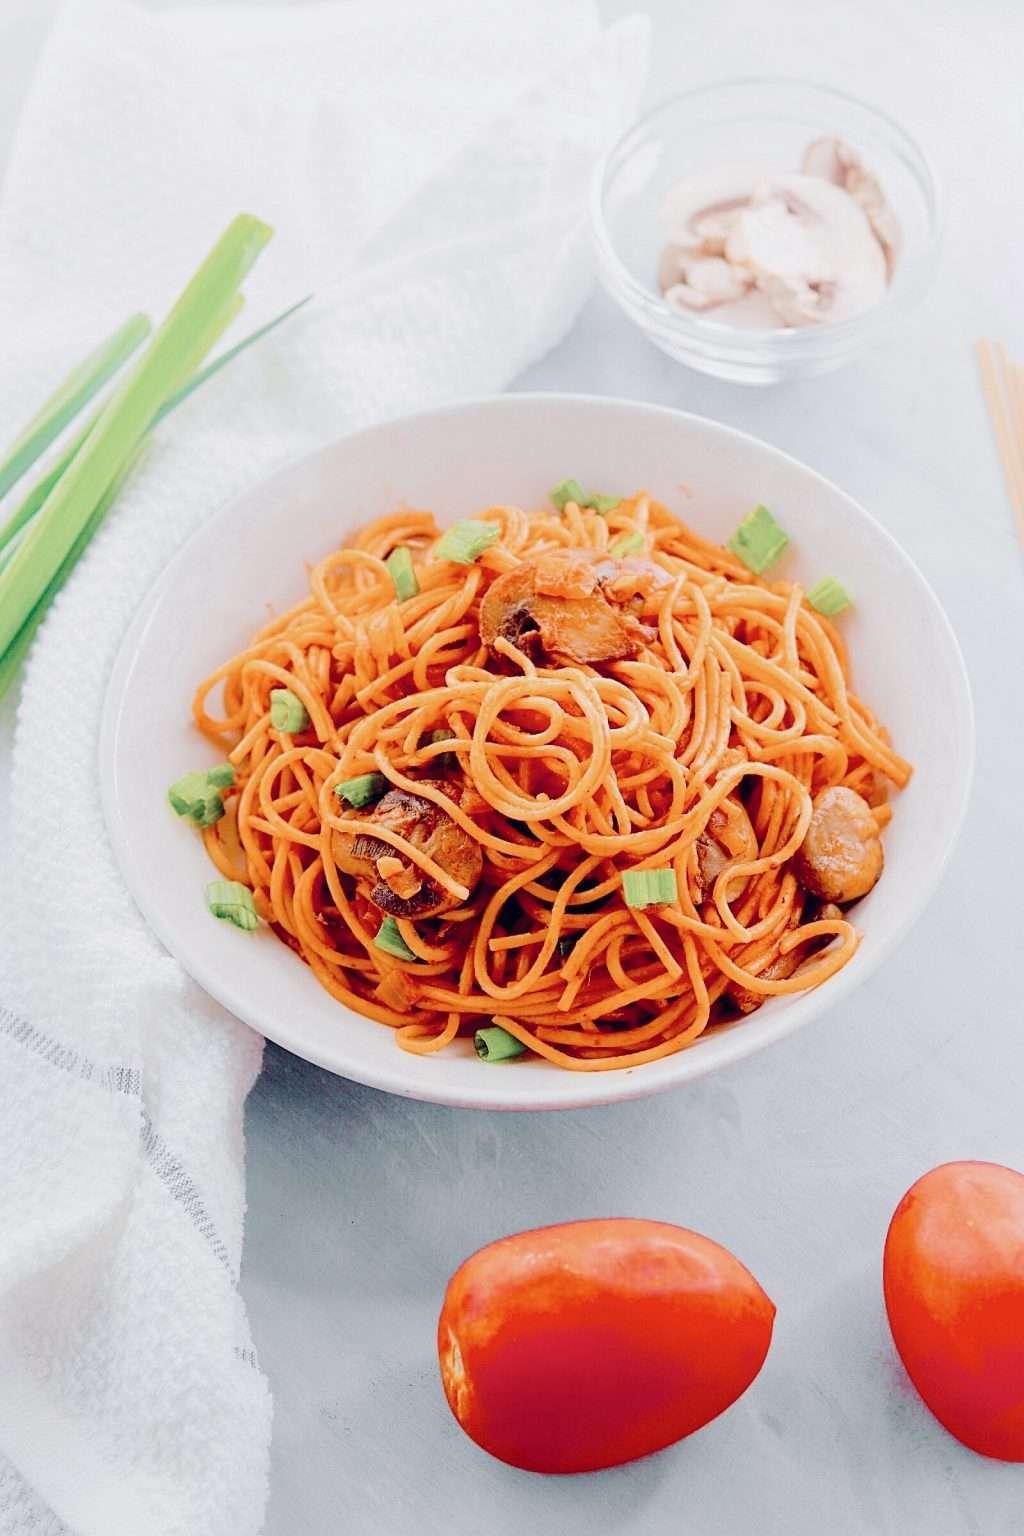 Vegan Spaghetti mushrooms recipe  02 02 2020 18 32 54 1024x1536 - HOME